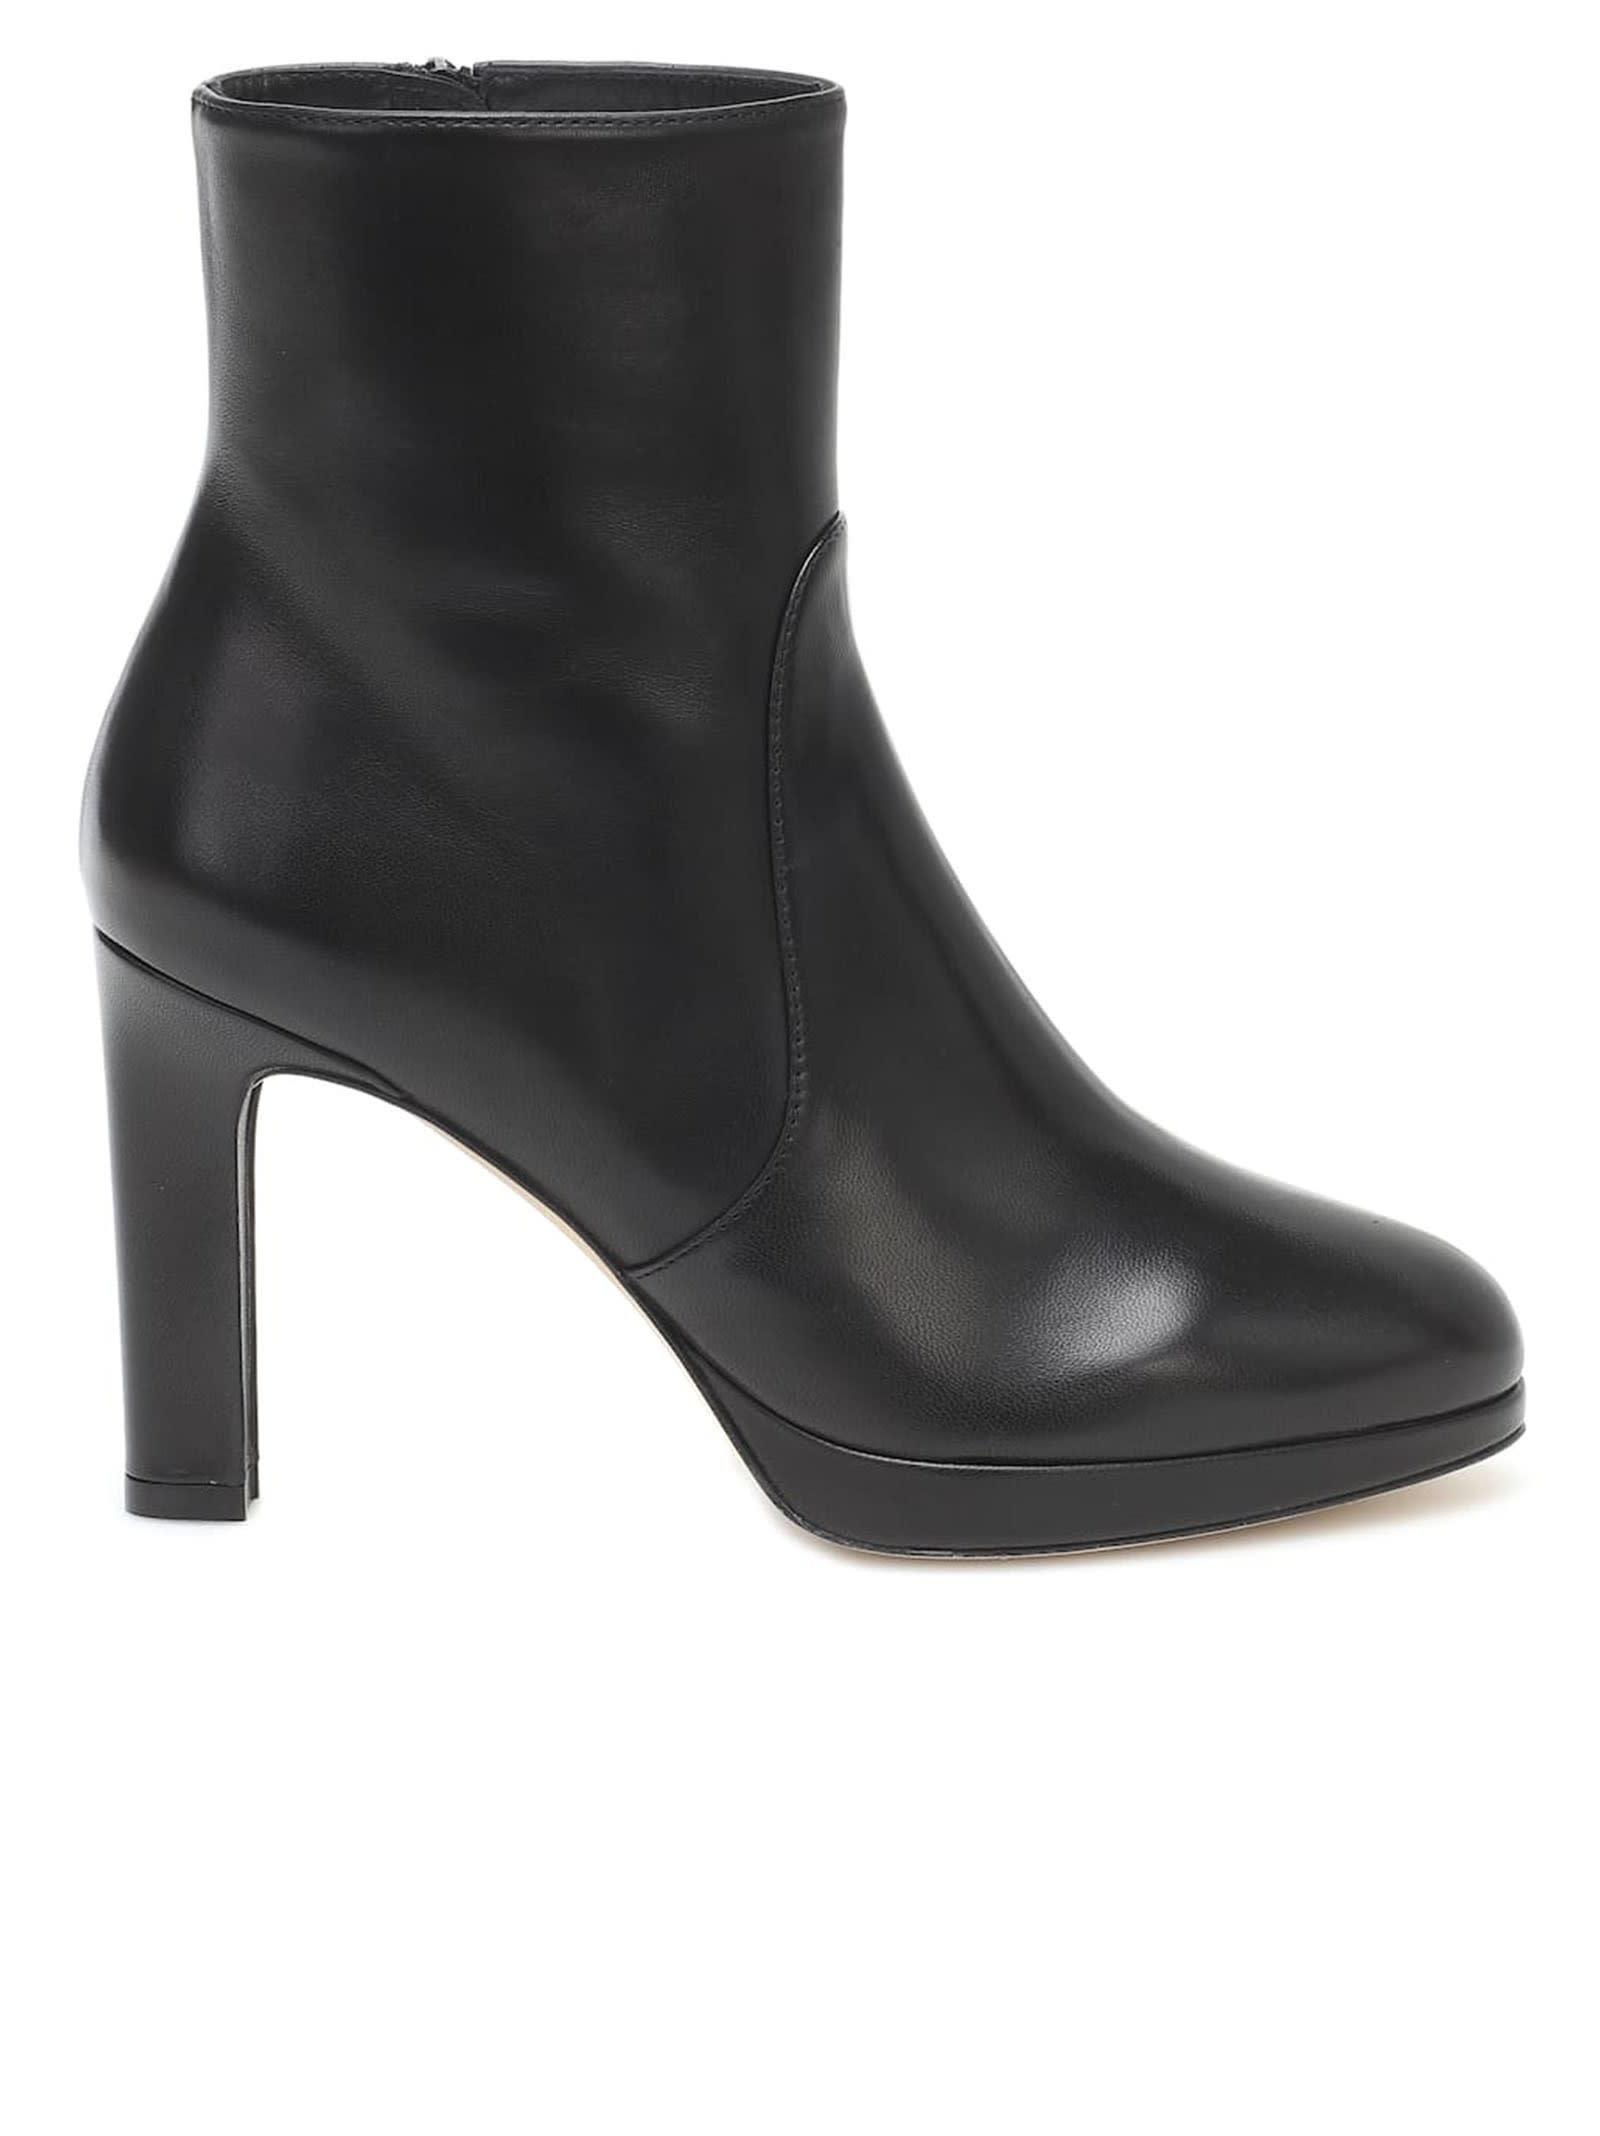 Stuart Weitzman 5051 Black Leather Alani Ankle Boots